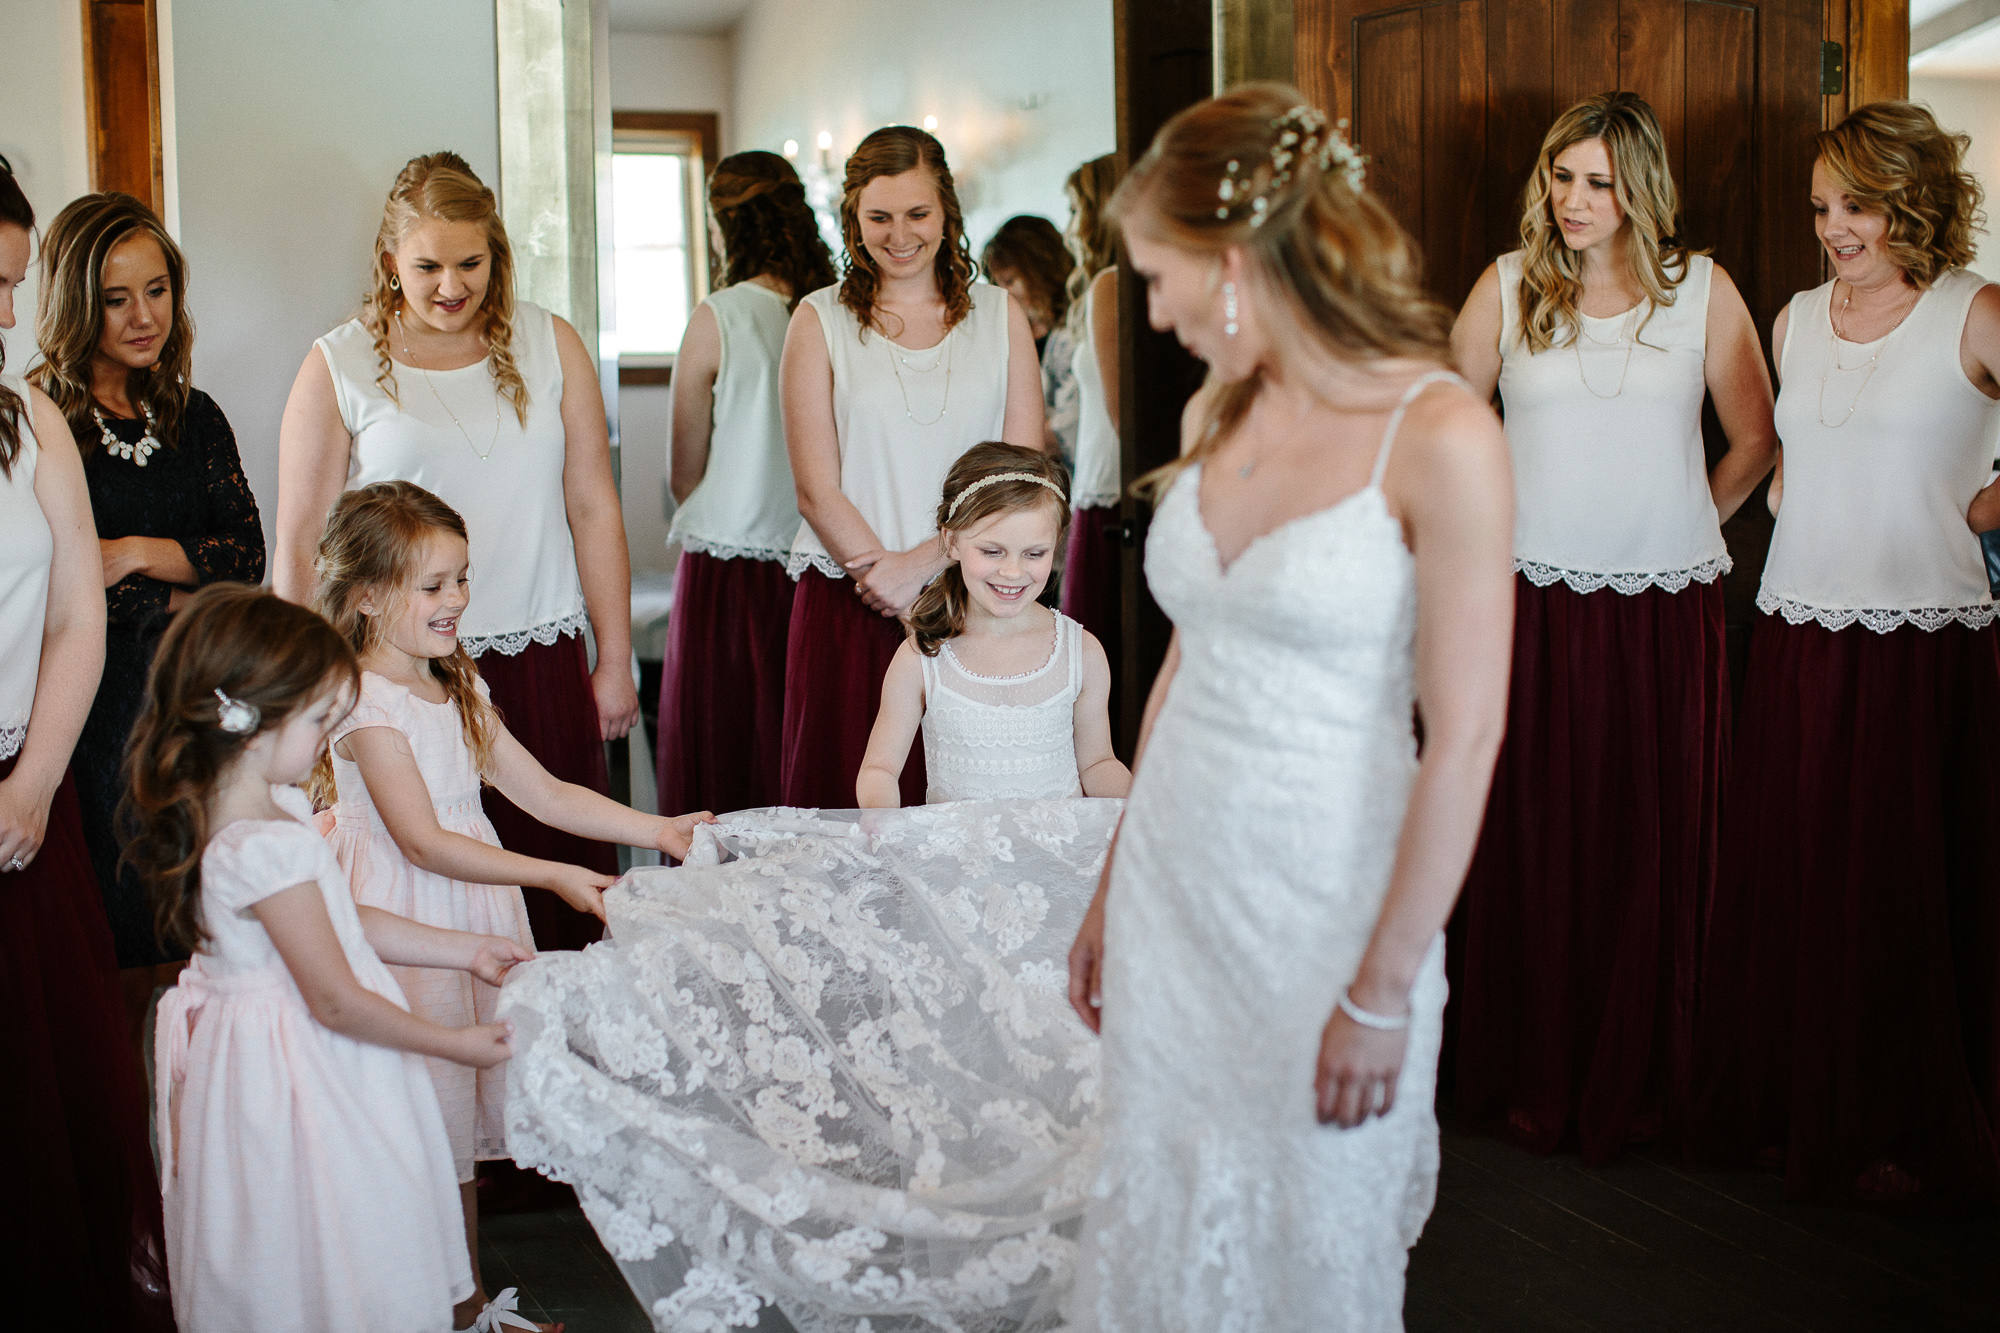 wedding-elopement-adventerous-romantic-timeless-south-dakota-blue-haven-barn-016.jpg